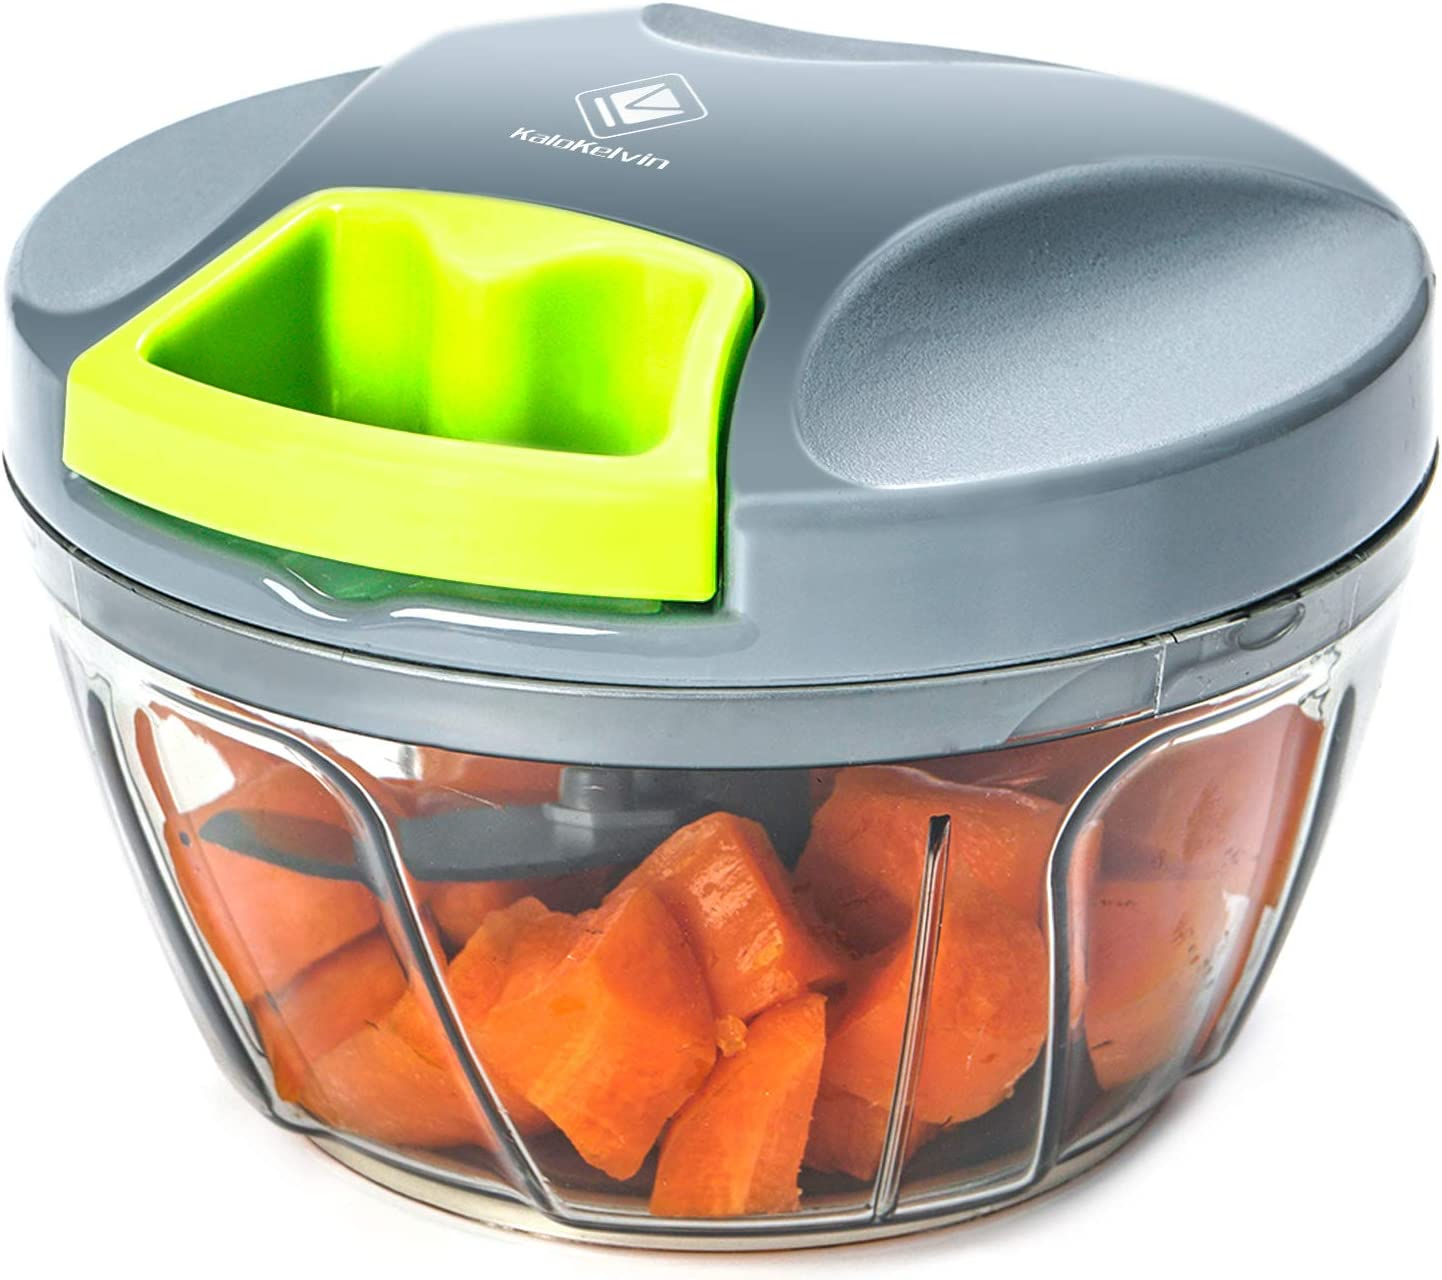 Kalokelvin Picadora Manual, Cortador de Verduras Mini Picadora Manual de Verduras/Ajo y Cebolla/Frutos Secos/Perejil/Carne, Picadora de Alimentos con Cuerda (400ML)